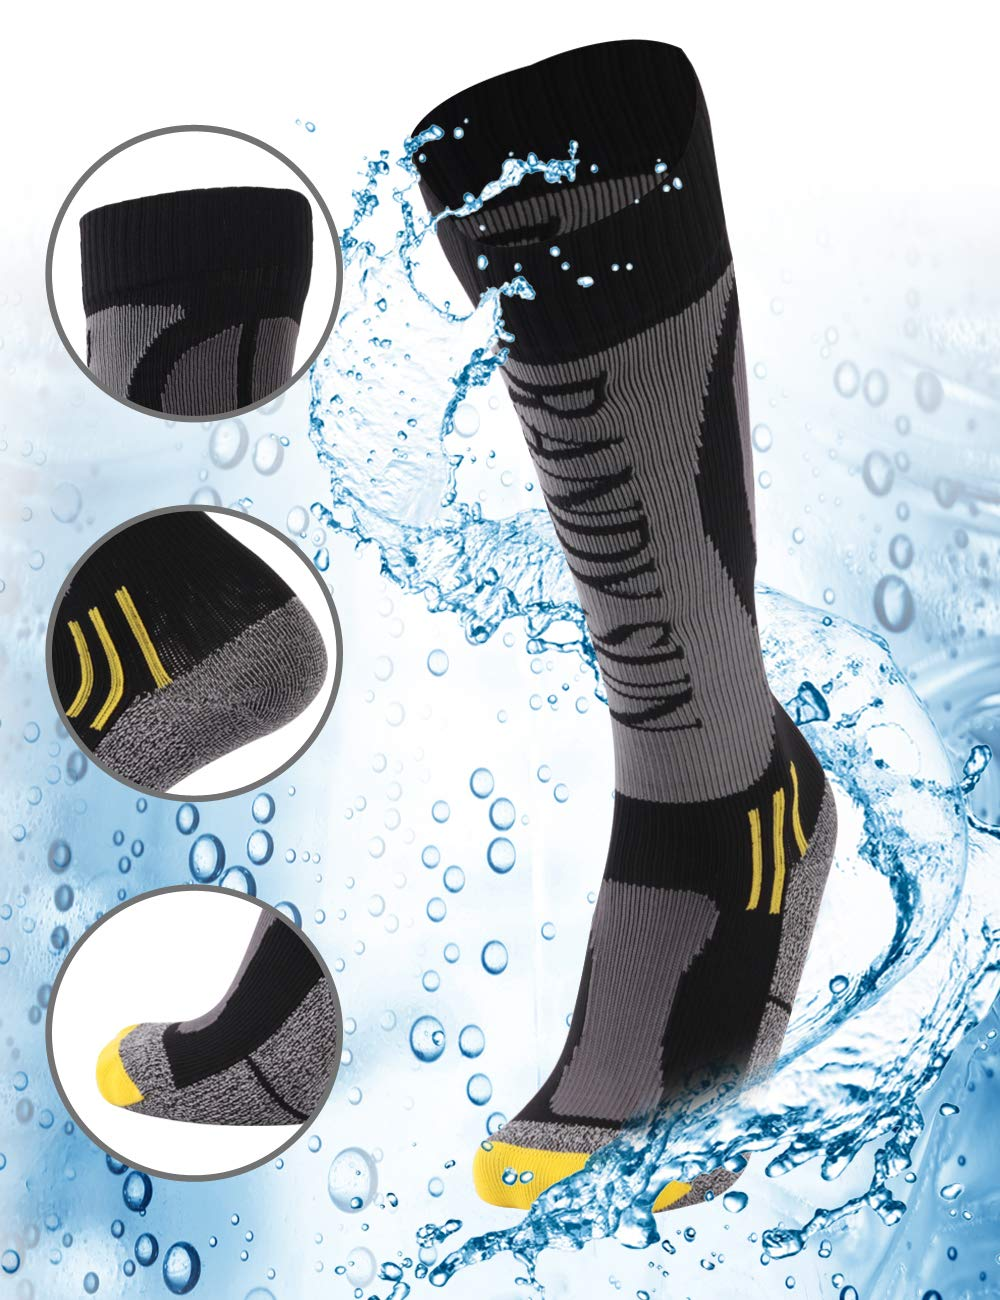 RANDY SUN Waterproof Cycling Socks, [SGS Certified] Unisex High Performance Fashin Socks Grey&Black S 1 Pair by RANDY SUN